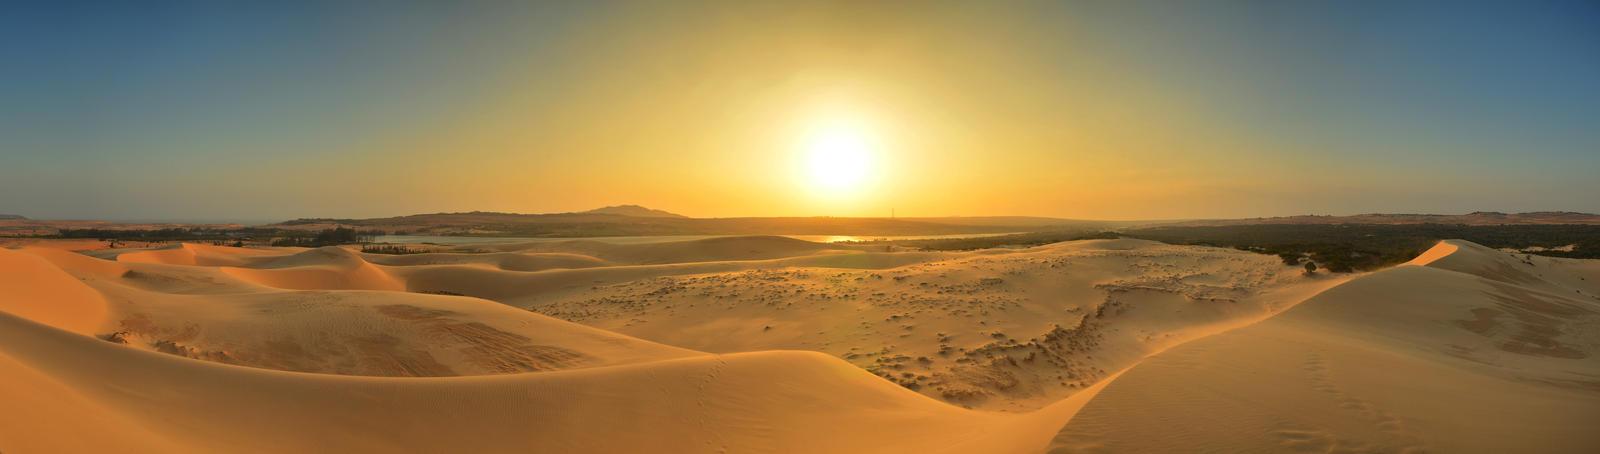 Mui Ne Dunes Panorama by comsic